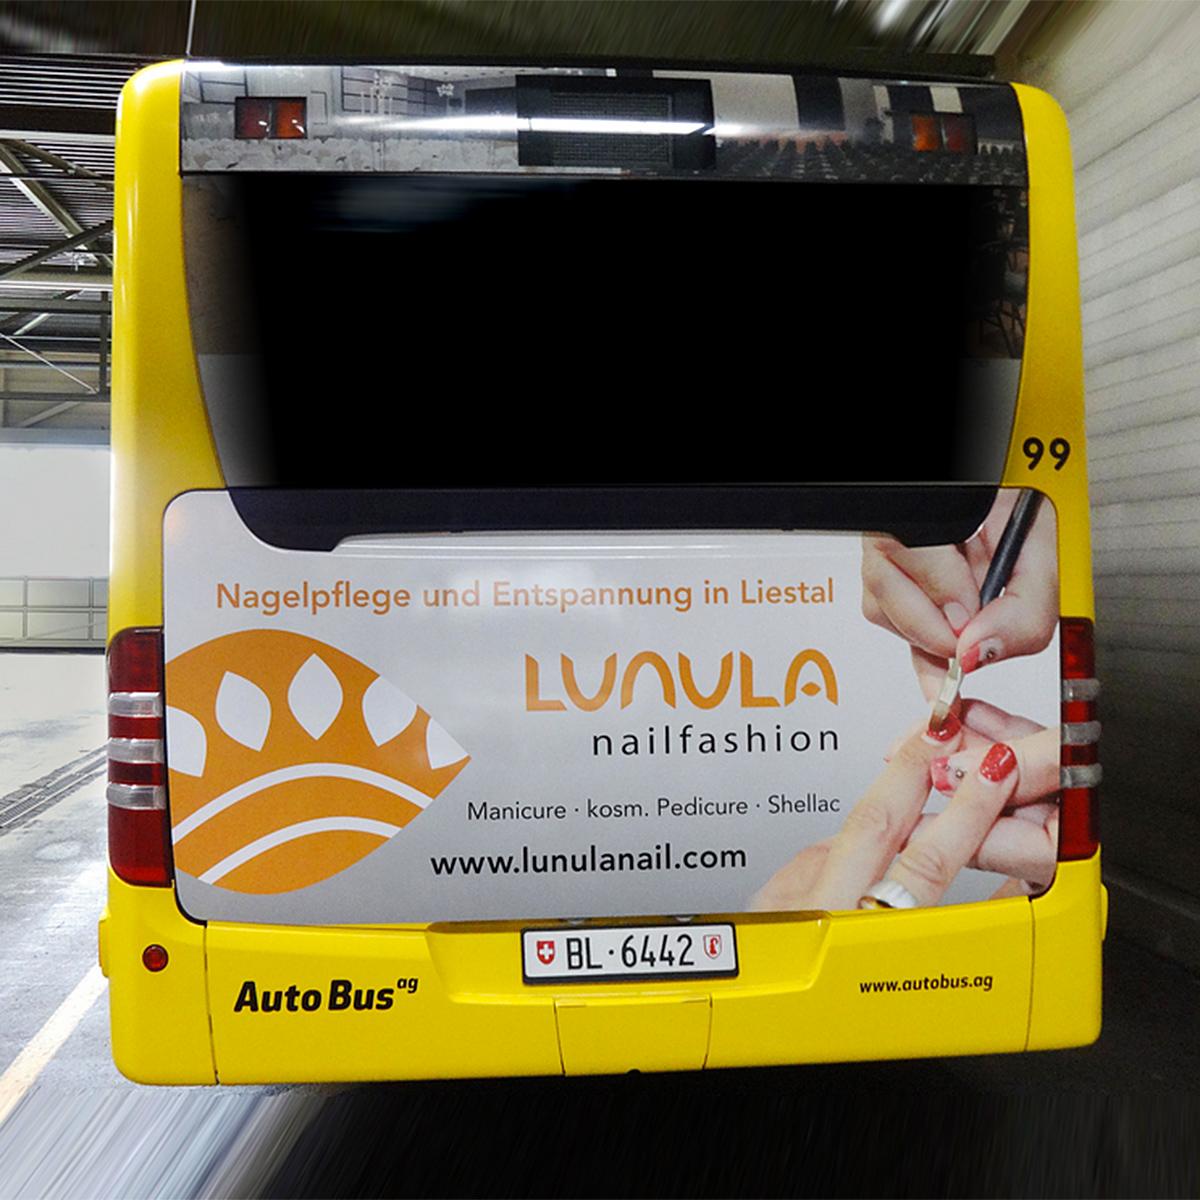 Busbeschriftung, Traffic Board, LUNULA nailfashion, Liestal